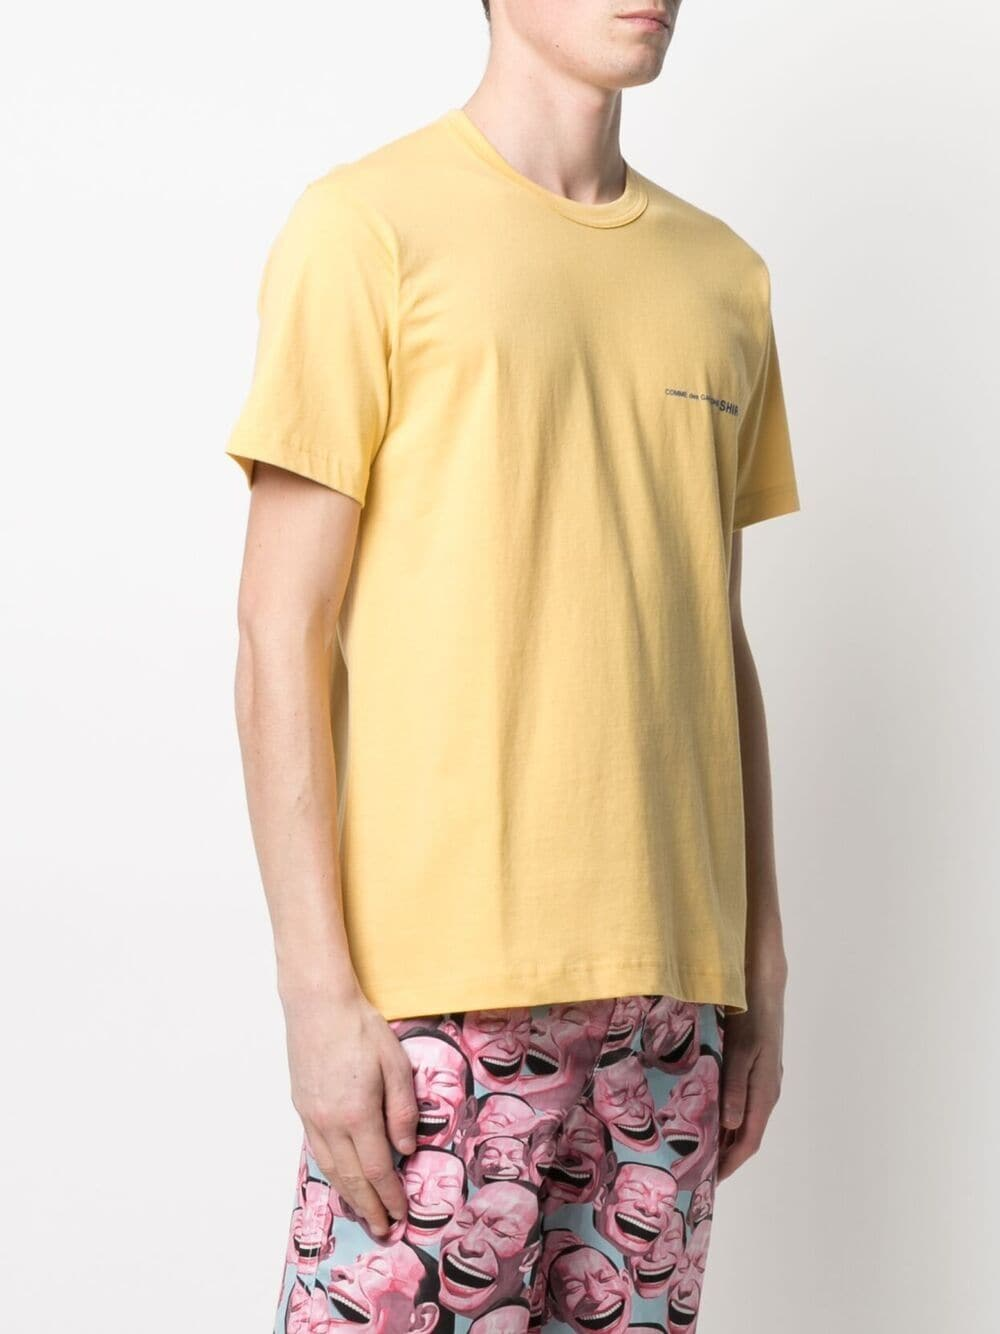 Comme Des Garçons Shirt t-shirt con logo stampato uomo COMME DES GARÇONS SHIRT | T-shirt | FG-T020YELLOW